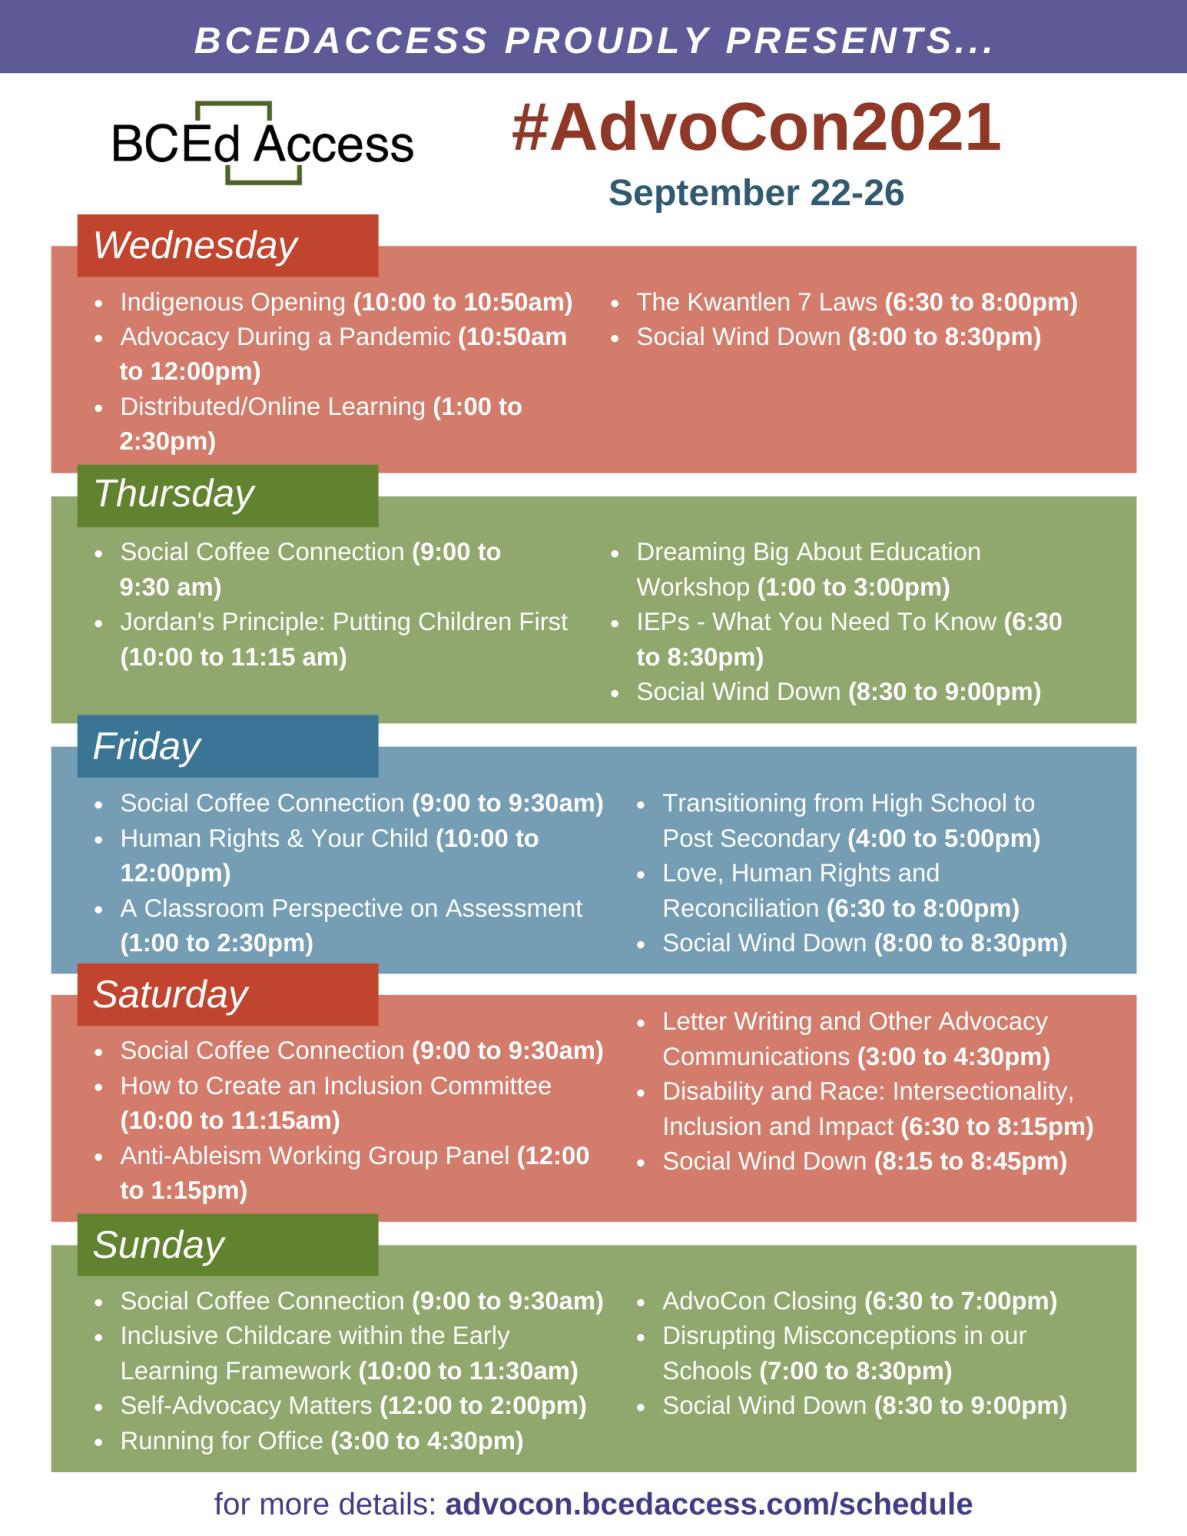 AdvoCon2021 Schedule